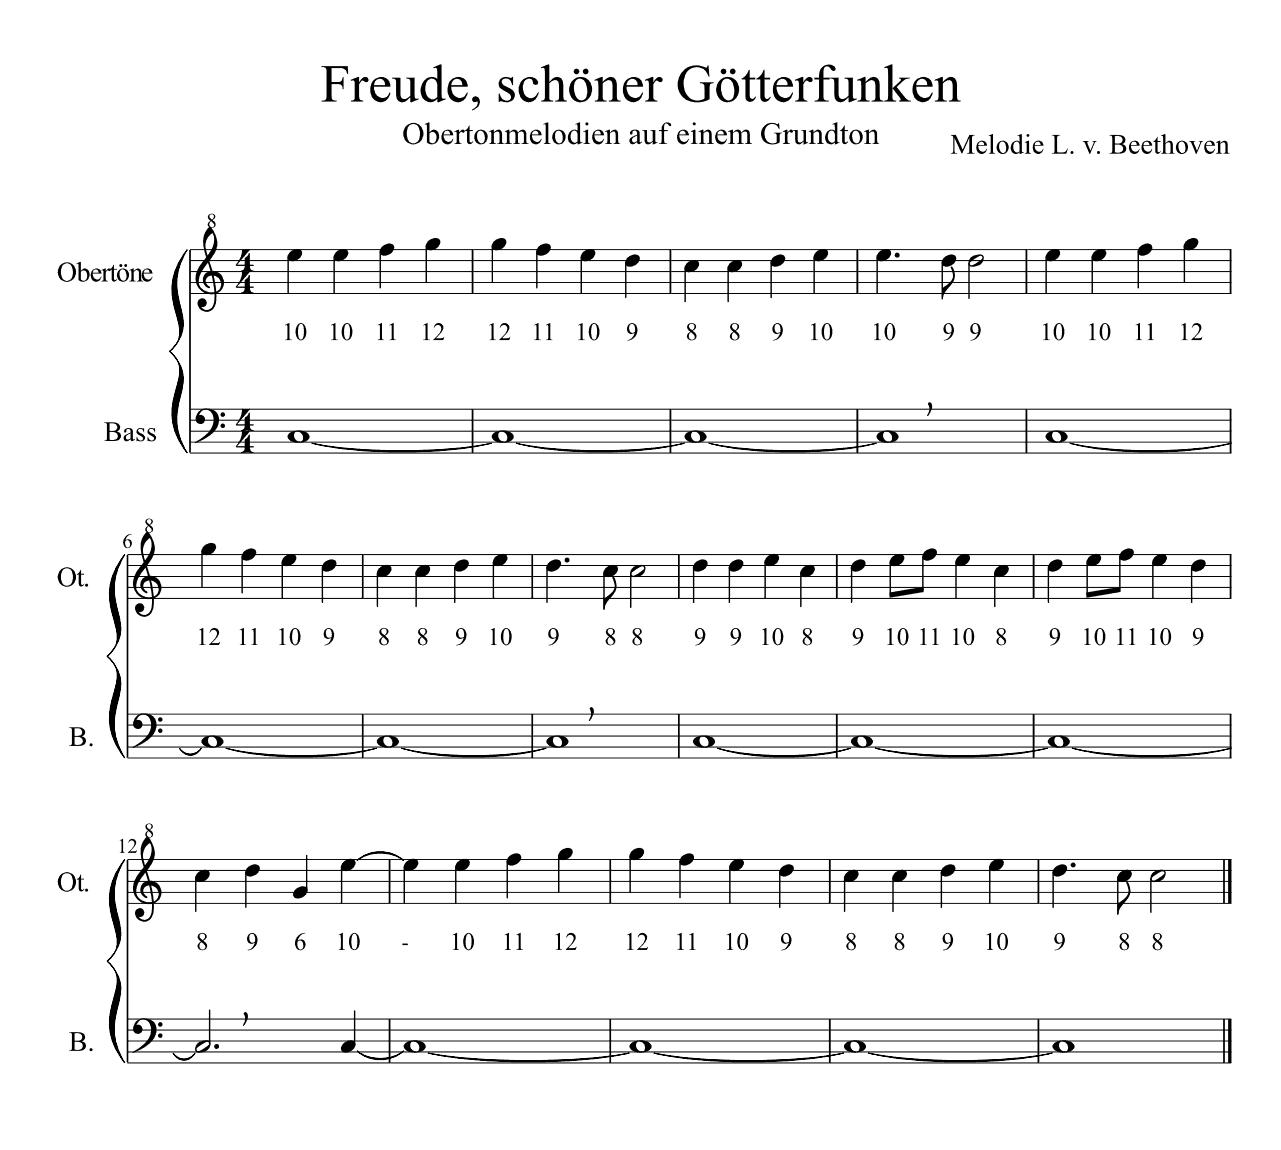 Beethoven - Freude schöner Götterfunken in g